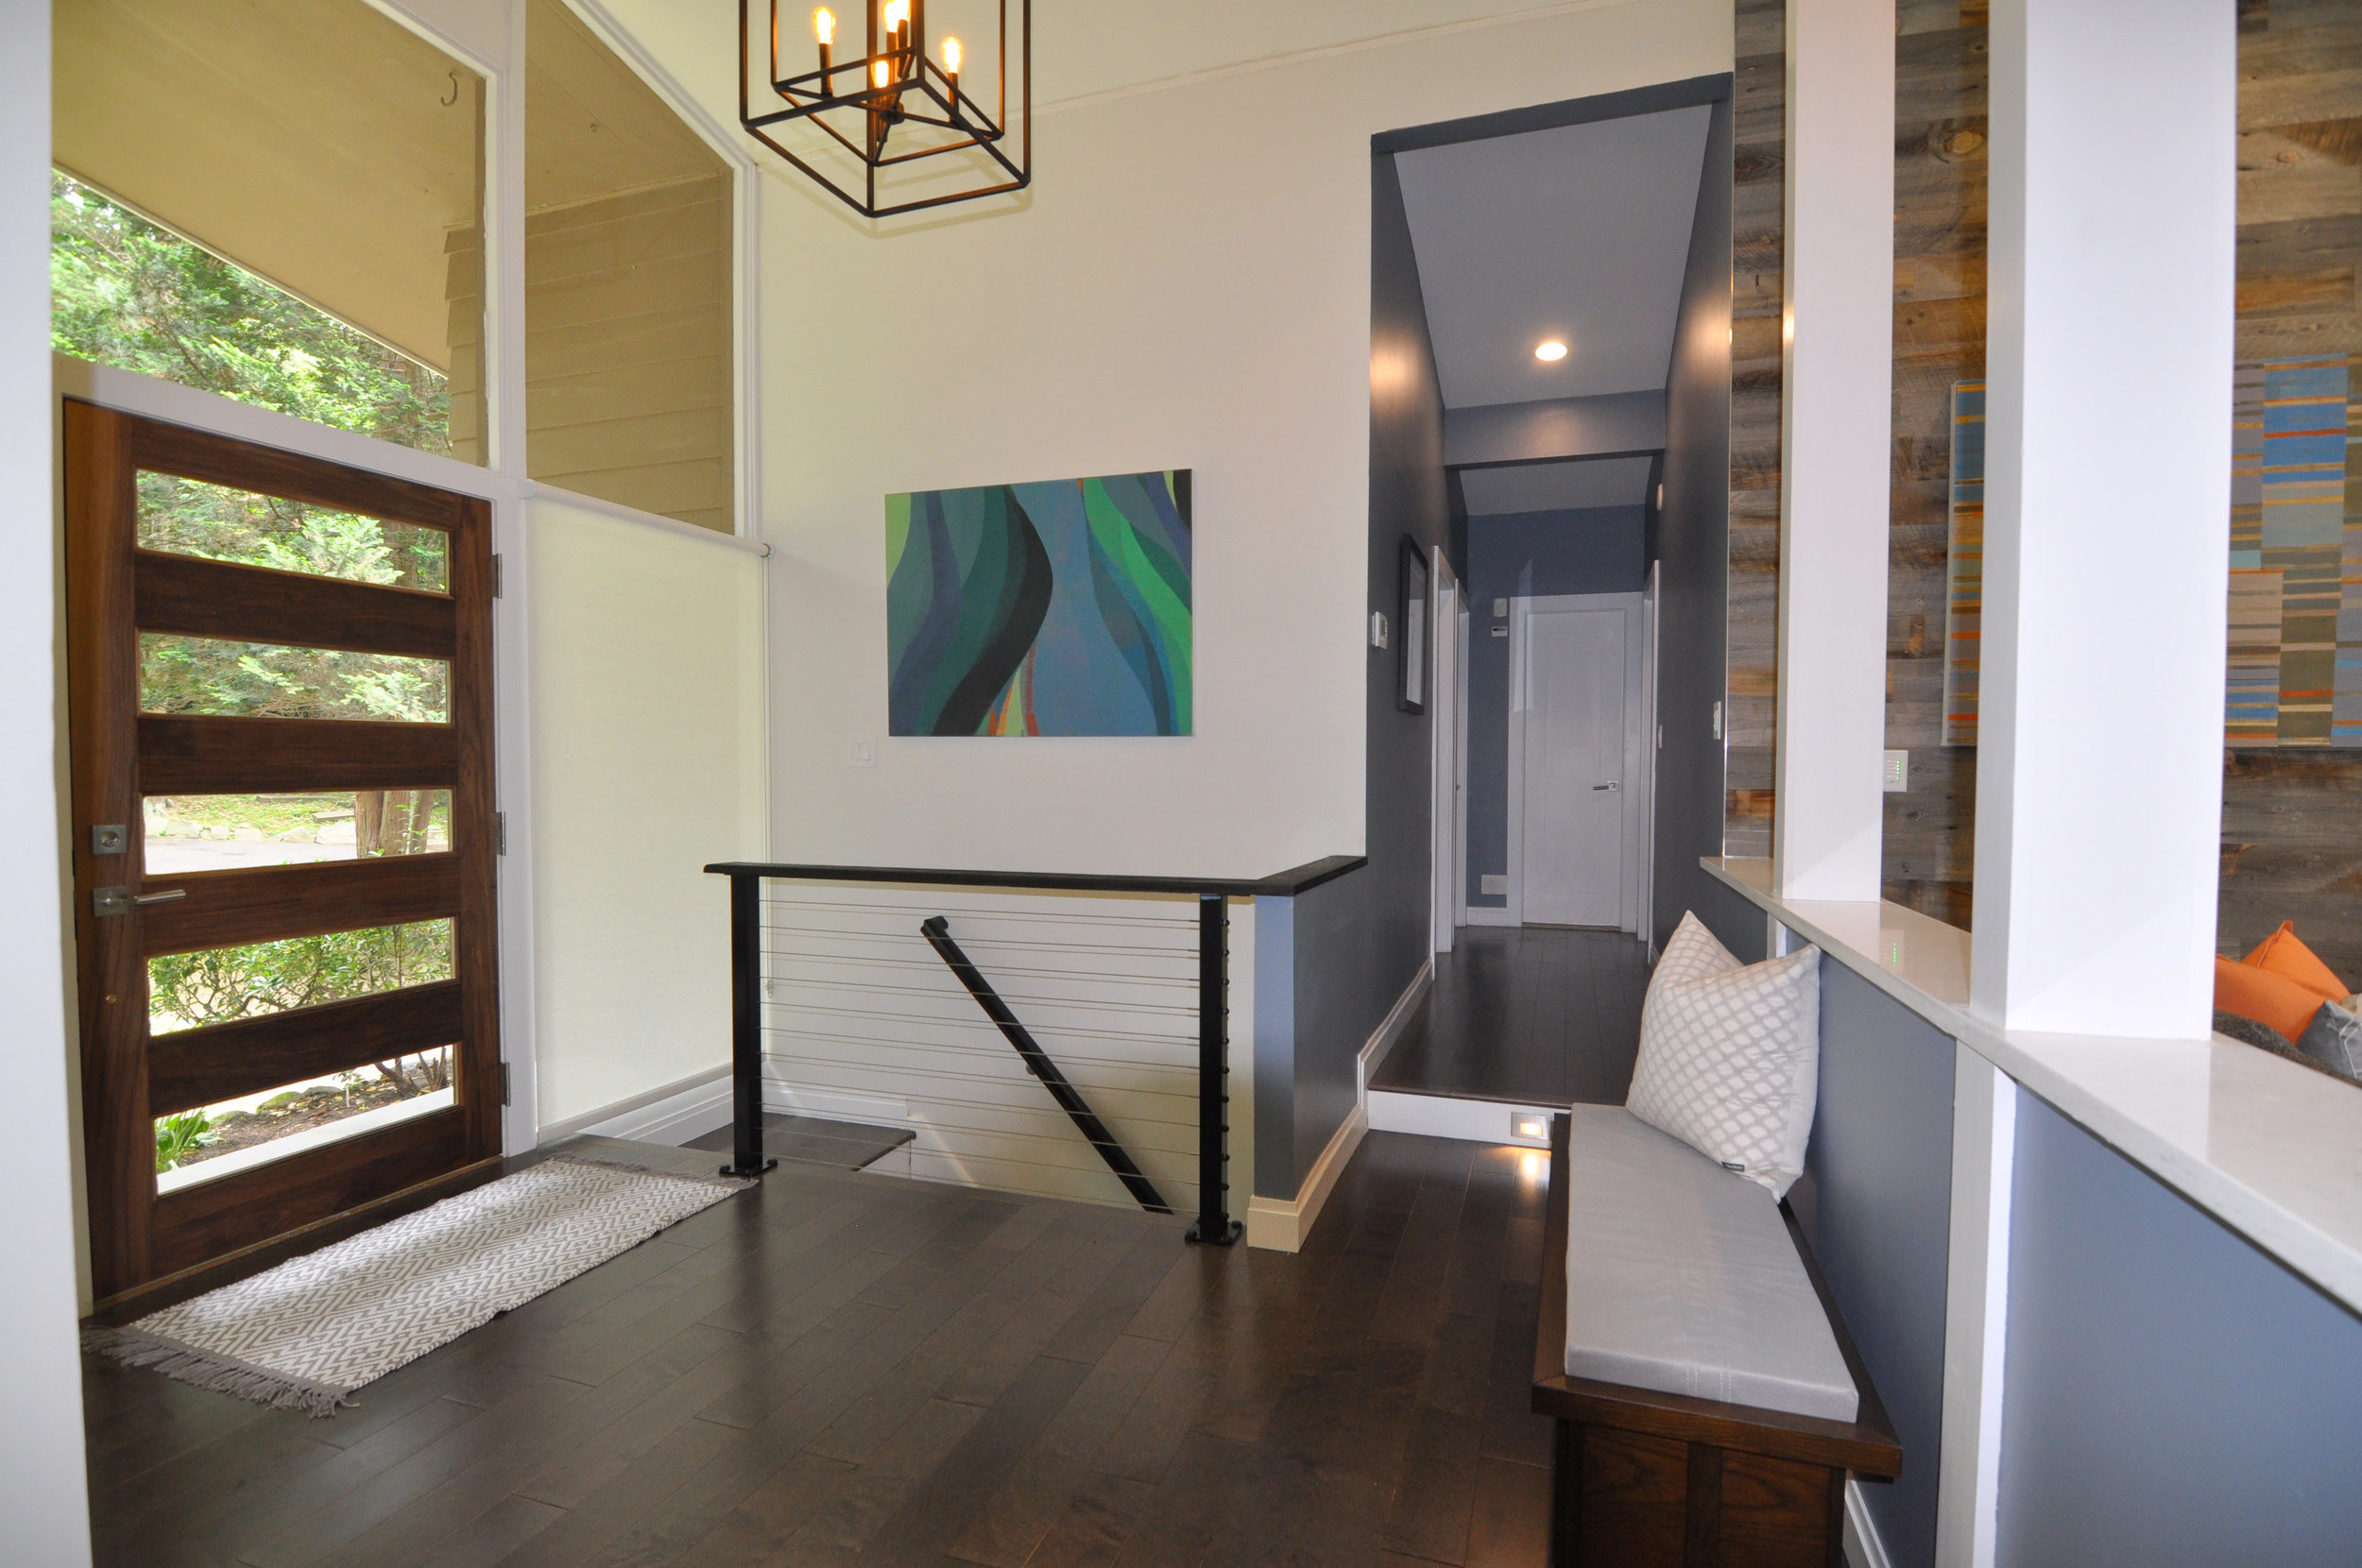 Kim A Mitchell_Design Lead_HGTV_The Property Brothers_Modern Entry_5-Light Wood Door_Wire Railing_Kenise Barnes Fine Art_2017.jpg